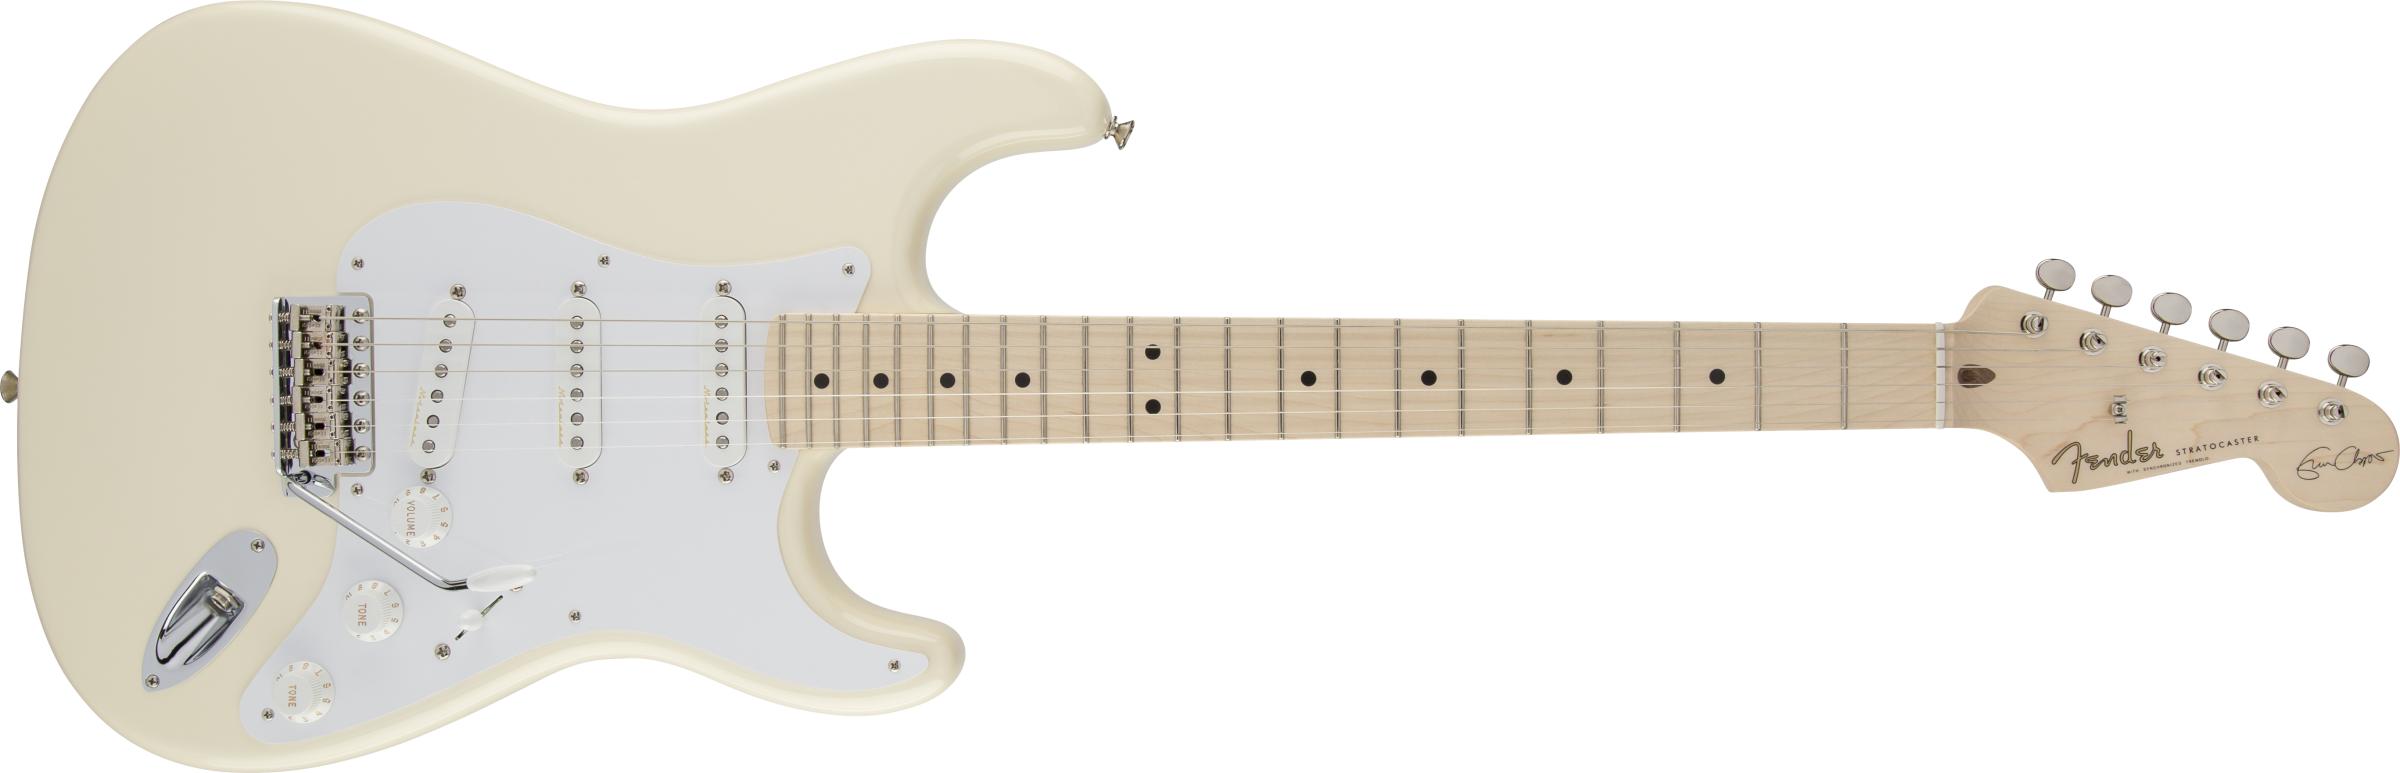 FENDER-Eric-Clapton-Stratocaster-Maple-Fingerboard-Olympic-White-sku-571000269